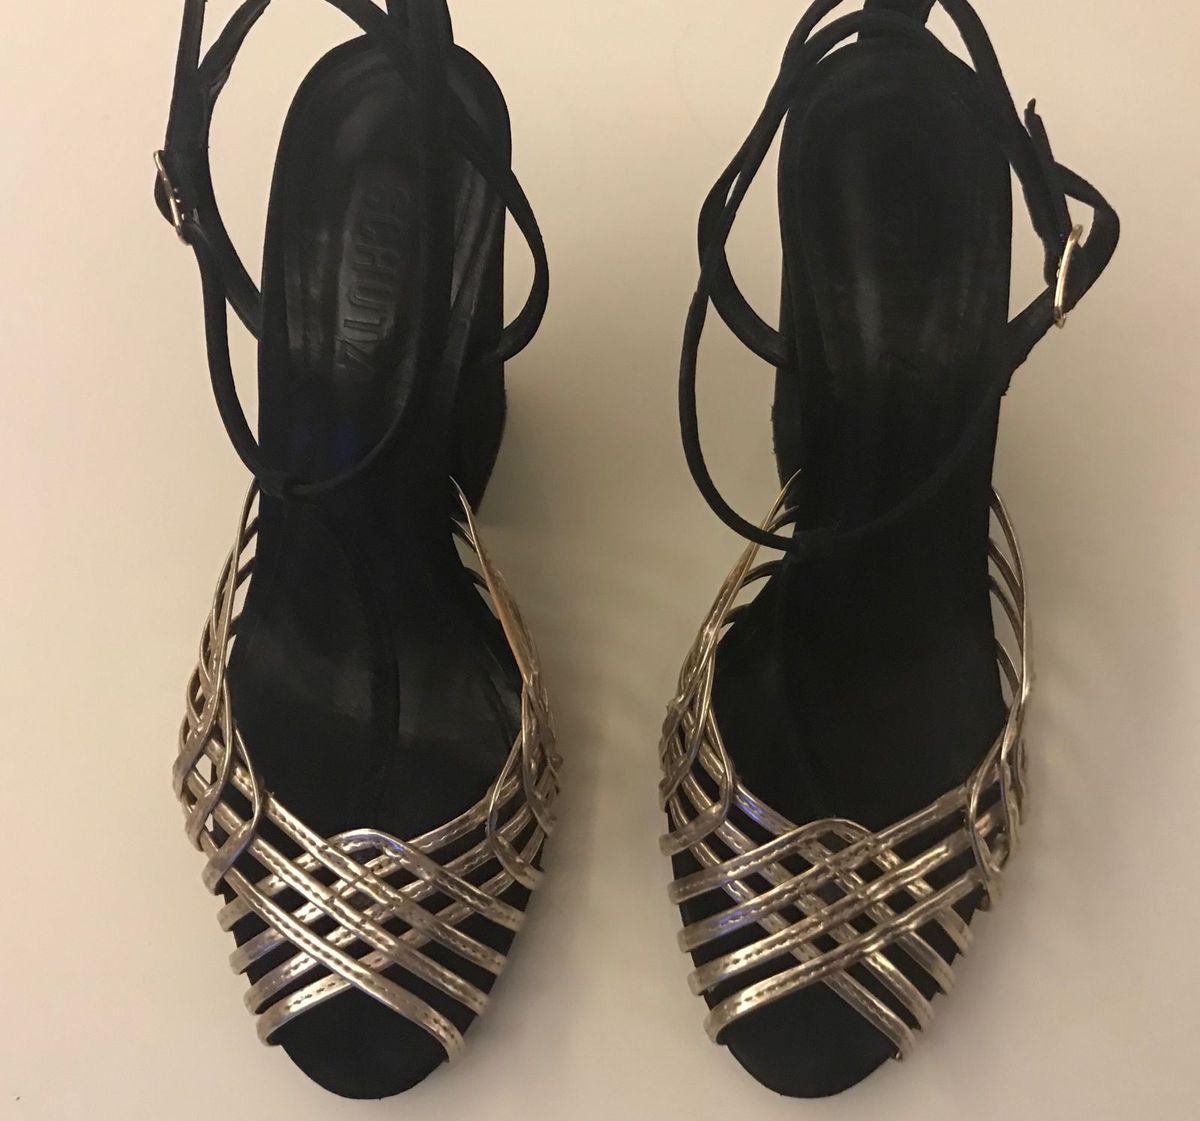 sandalia preta e dourada camurça schutz - sandálias schutz